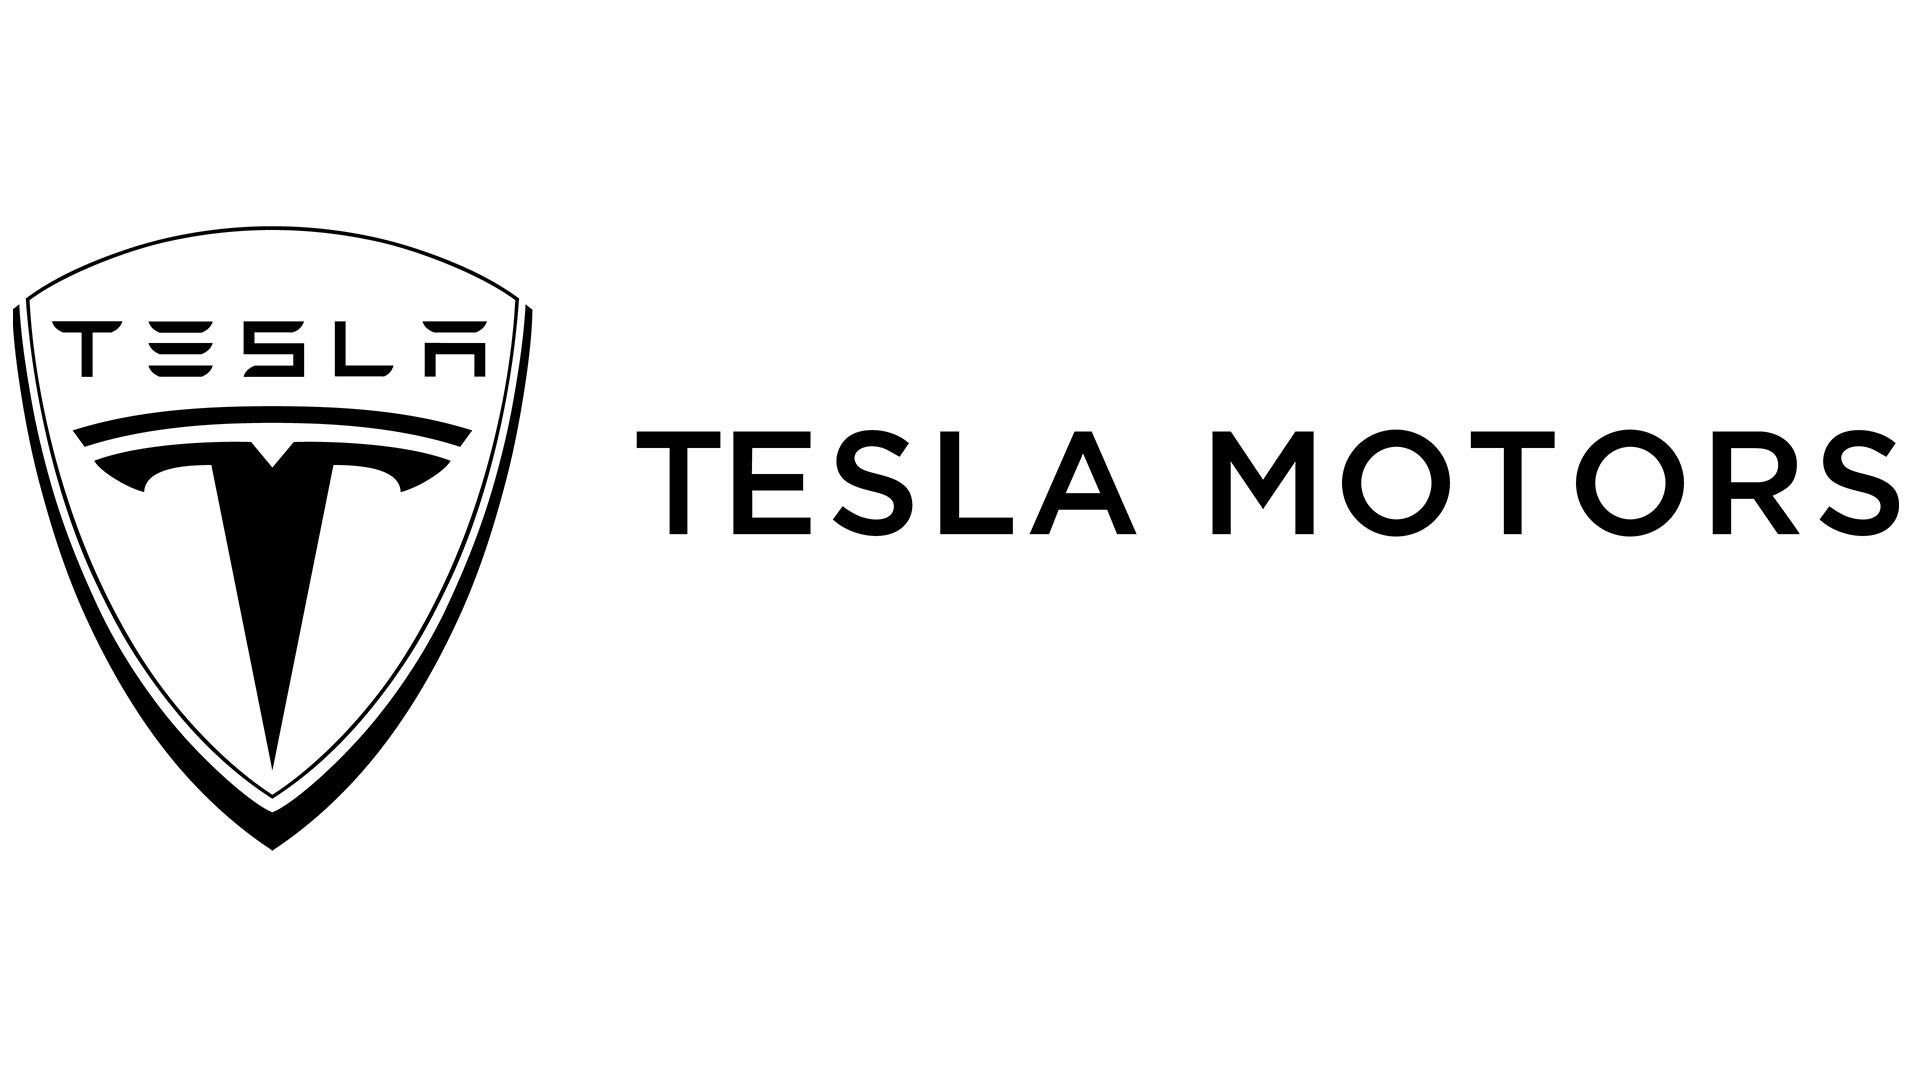 Tesla Motors Logo Meaning